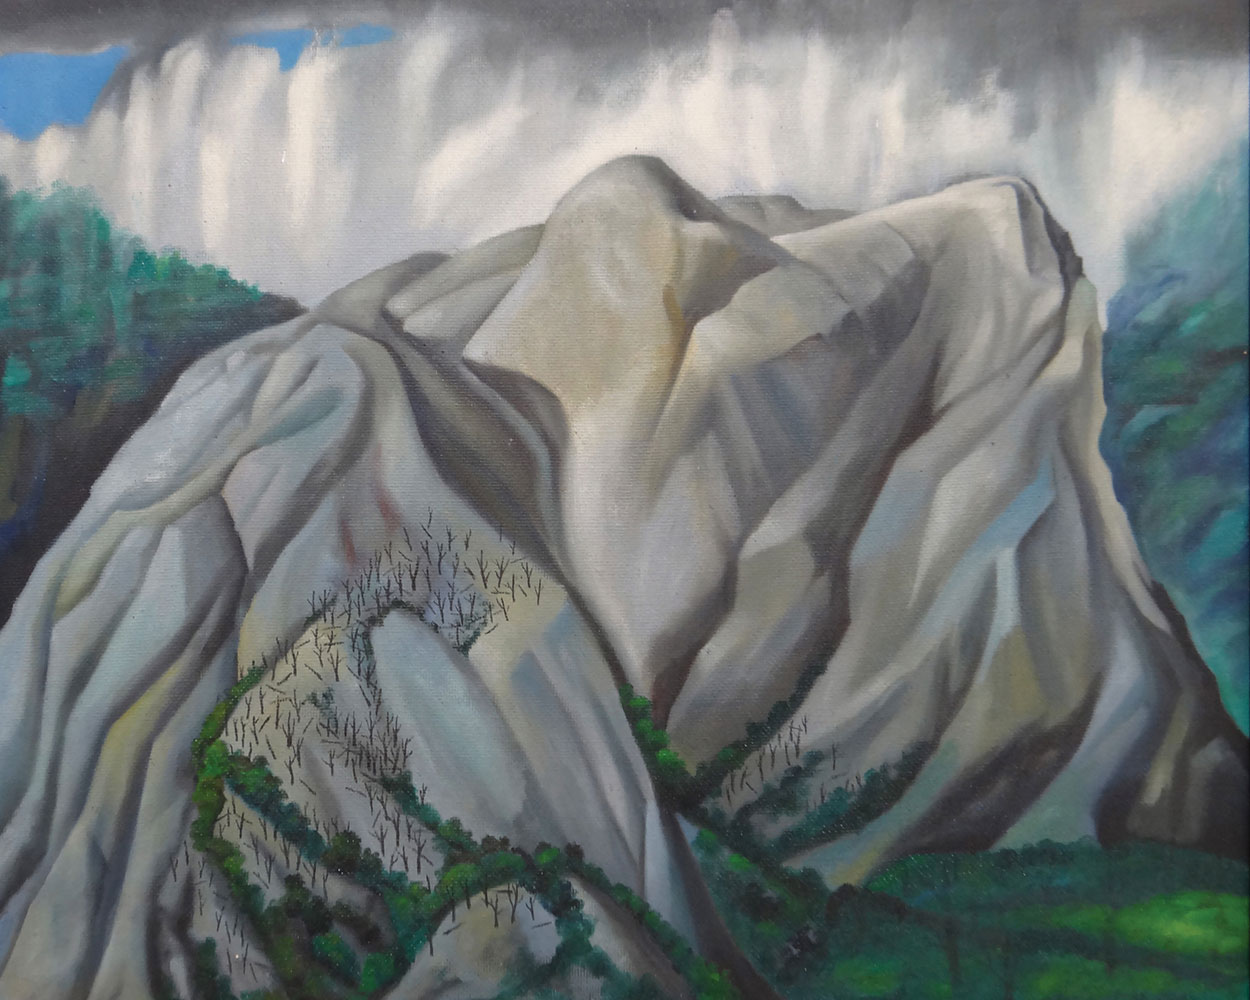 Leo BENSEMANN (New Zealander, b.1912, d.1986),    After Rain, Takaka , 1971, oil on canvas board. Collection of The Suter Art Gallery Te Aratoi o Whakatū: purchased, 2016